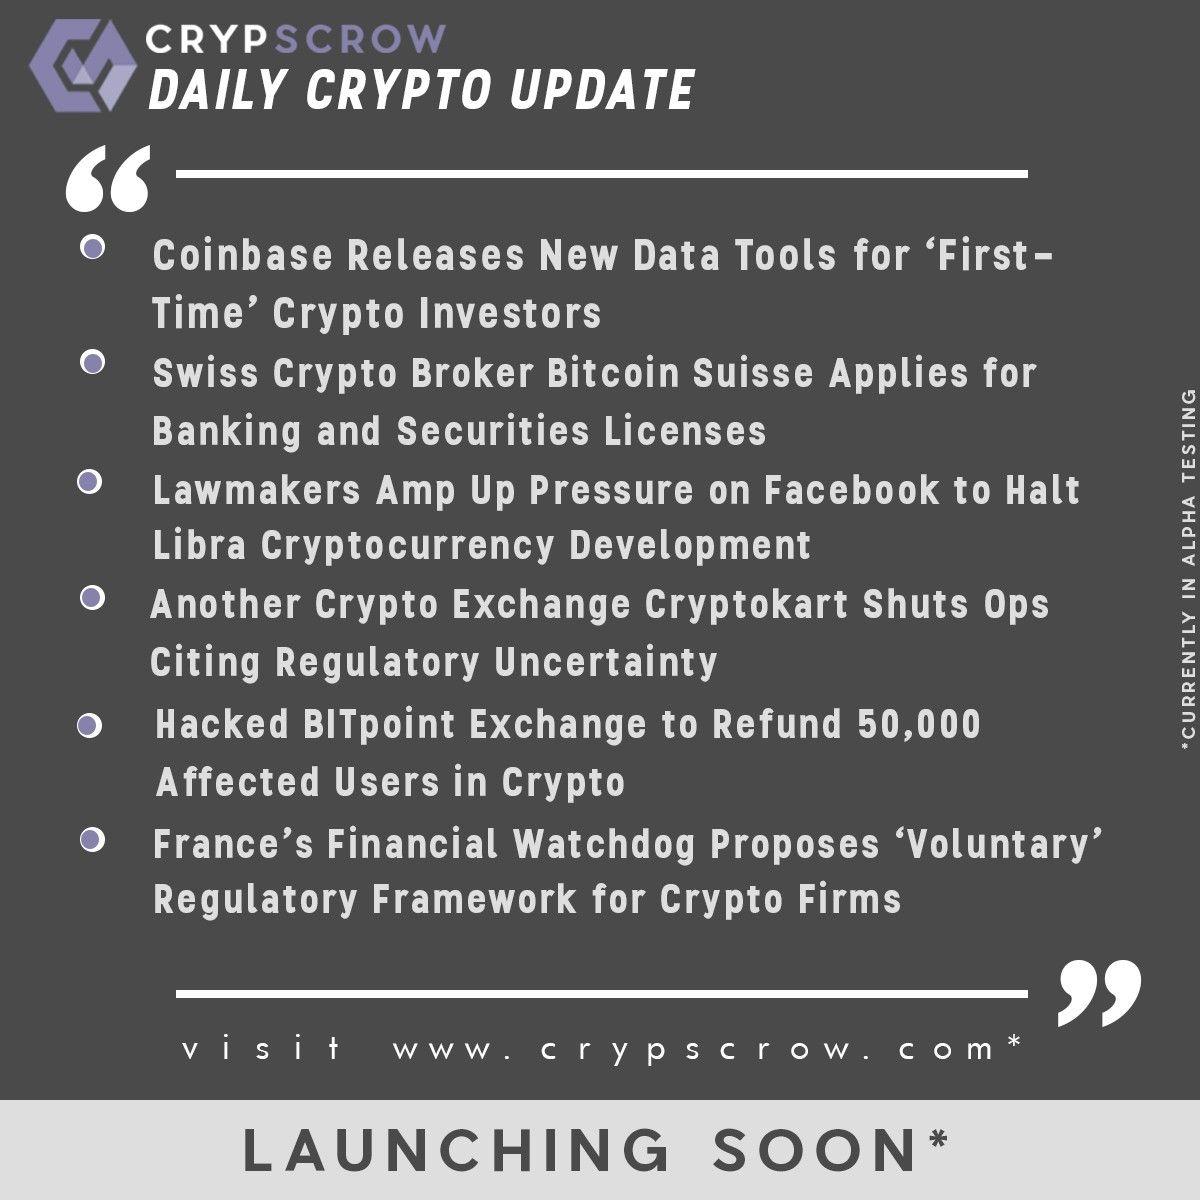 Dailycryptoupdate Cryptonews Crypscrow Coinbase Newdatatool